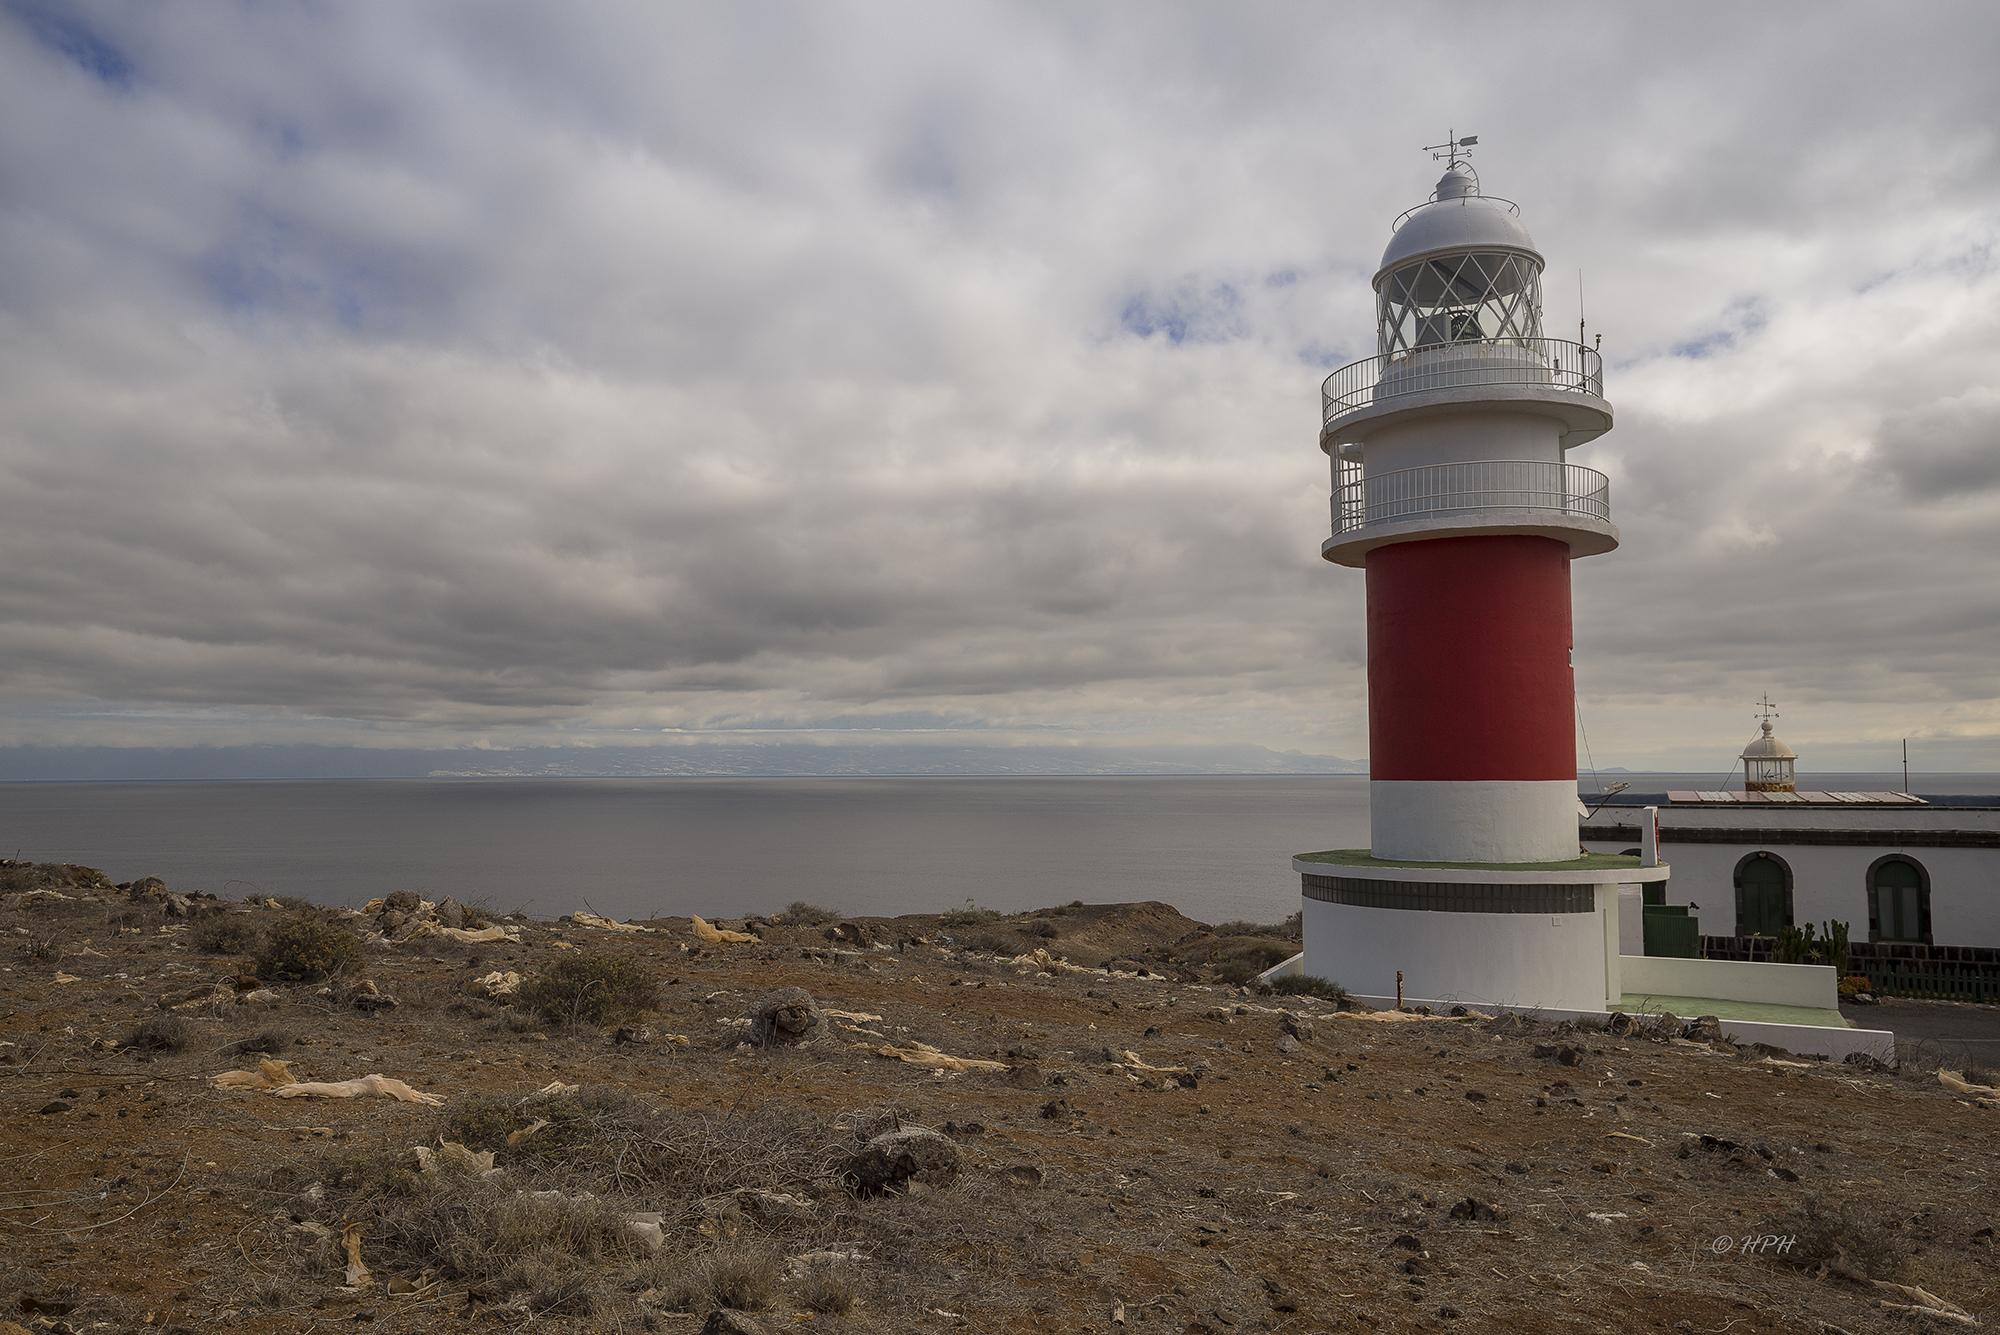 Lighthouse San Christobal, La Gomera, Spain